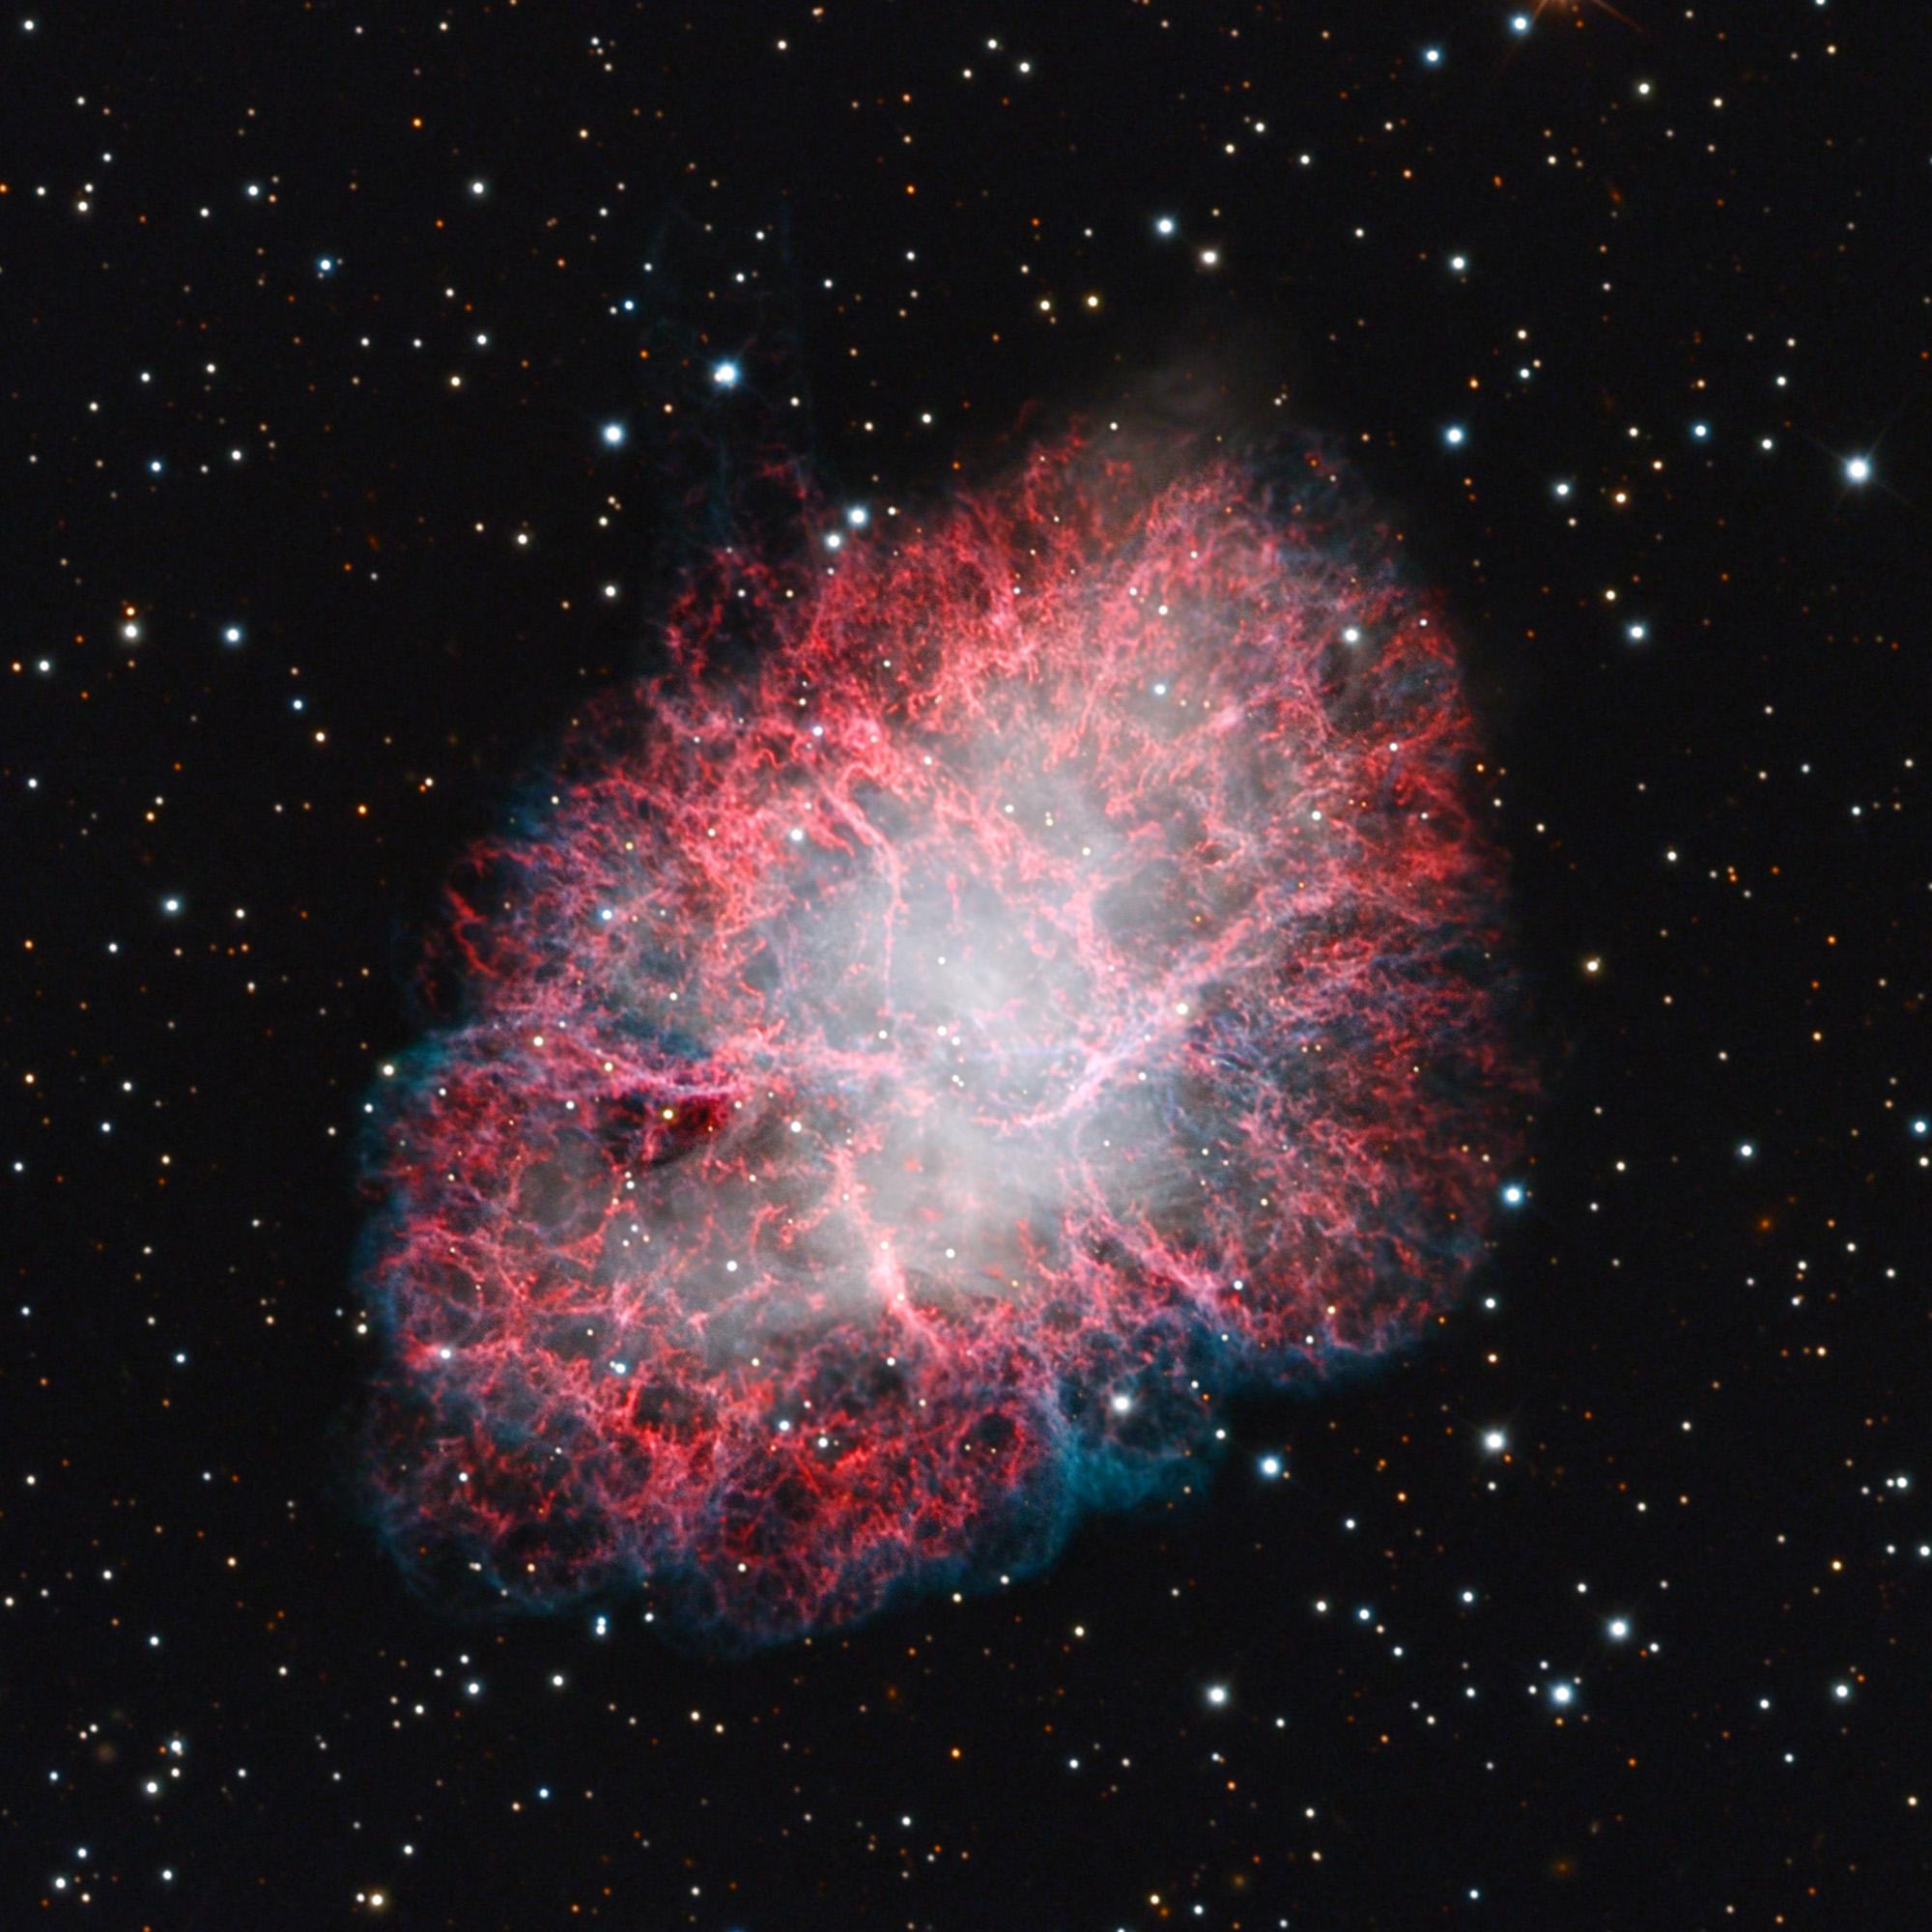 m1 astronomy crab nebula - photo #2